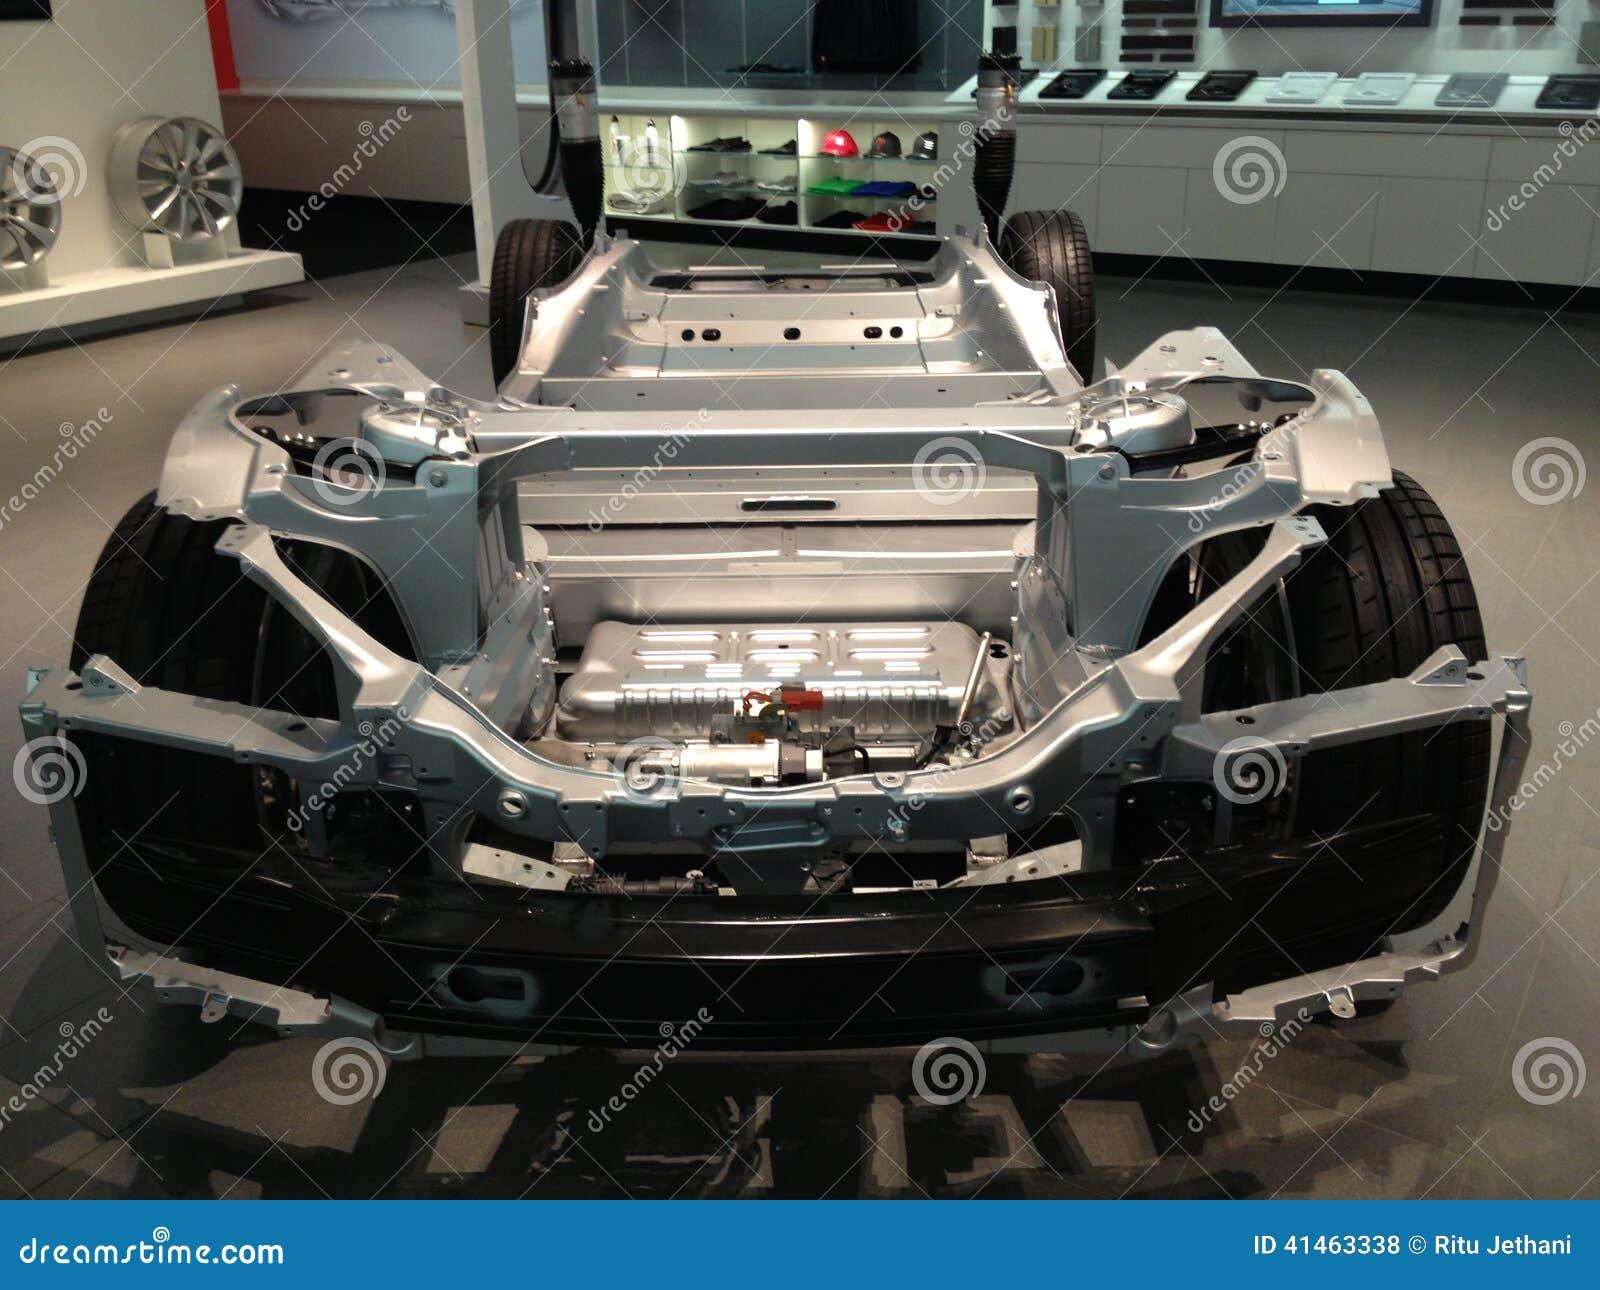 tesla car interior stock photo image 41463338. Black Bedroom Furniture Sets. Home Design Ideas